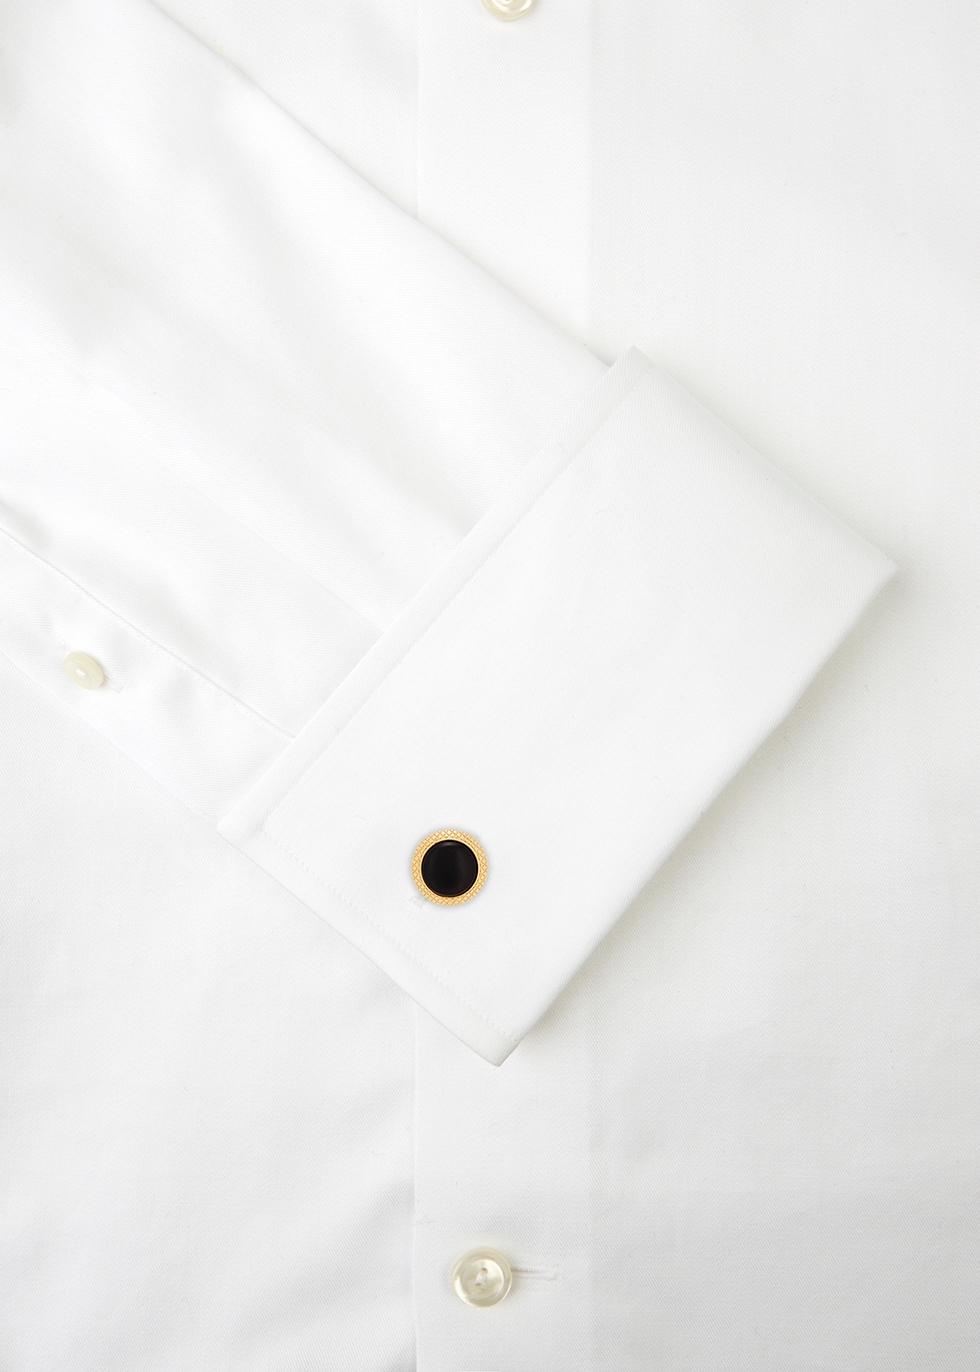 Bullseye gold-tone onyx cufflinks - Tateossian